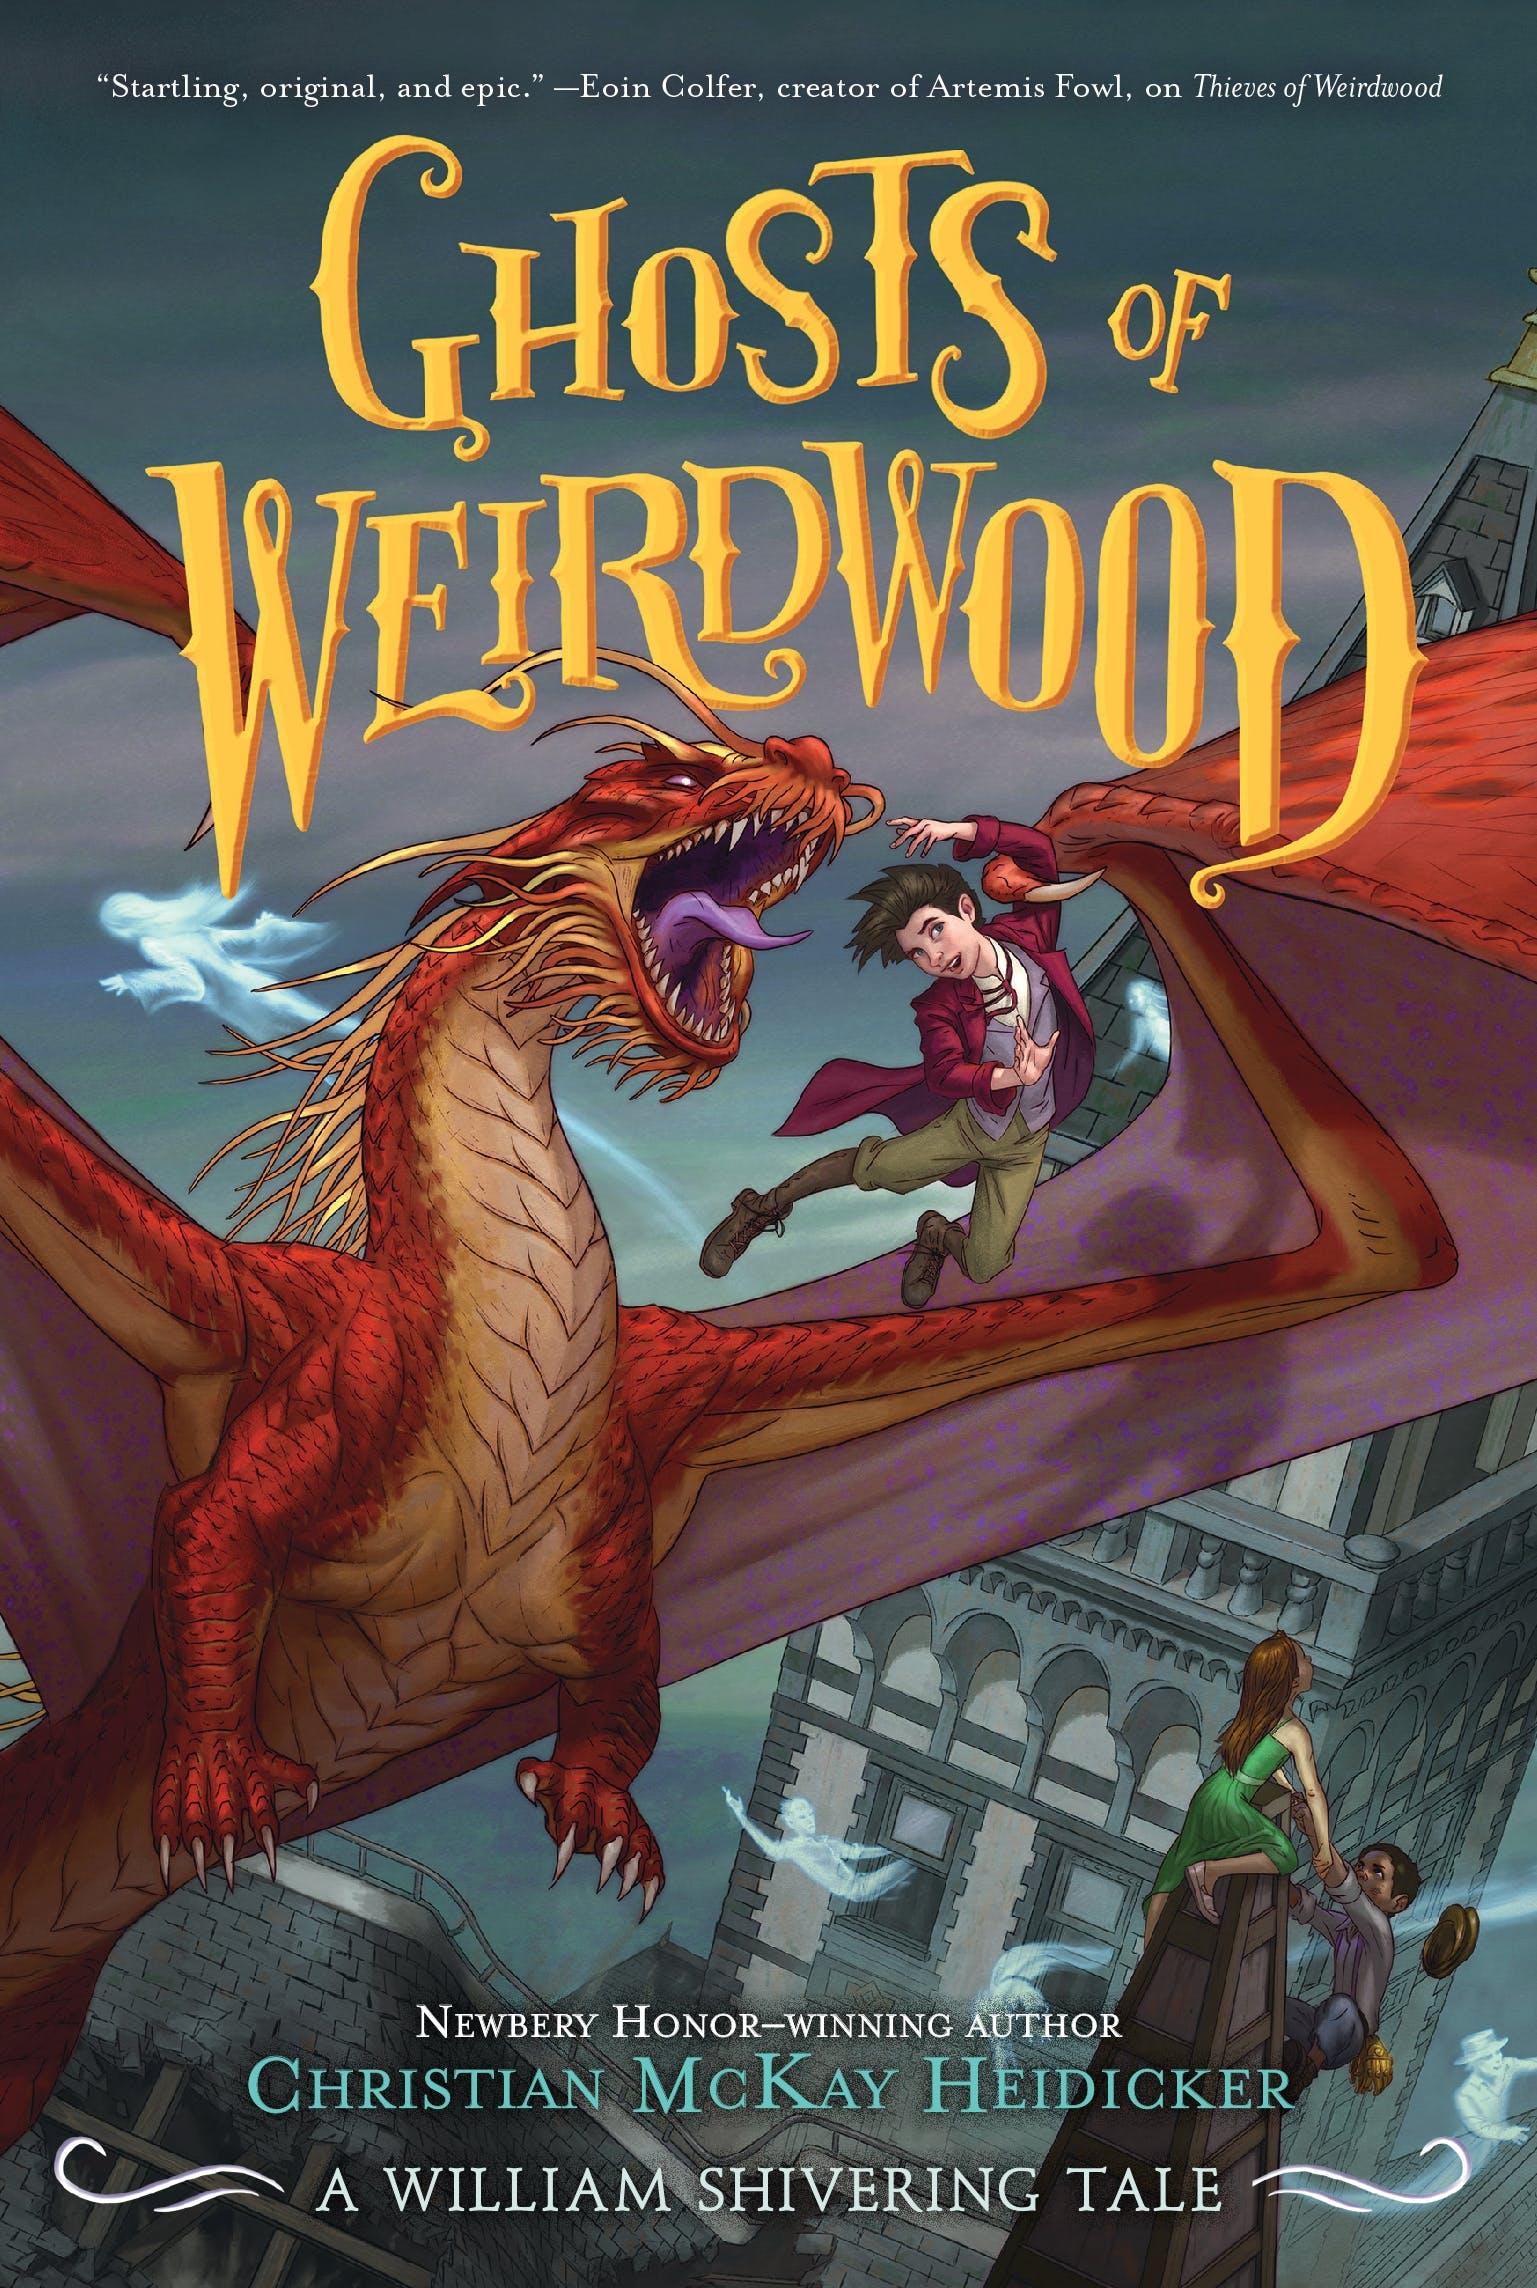 Image of Ghosts of Weirdwood